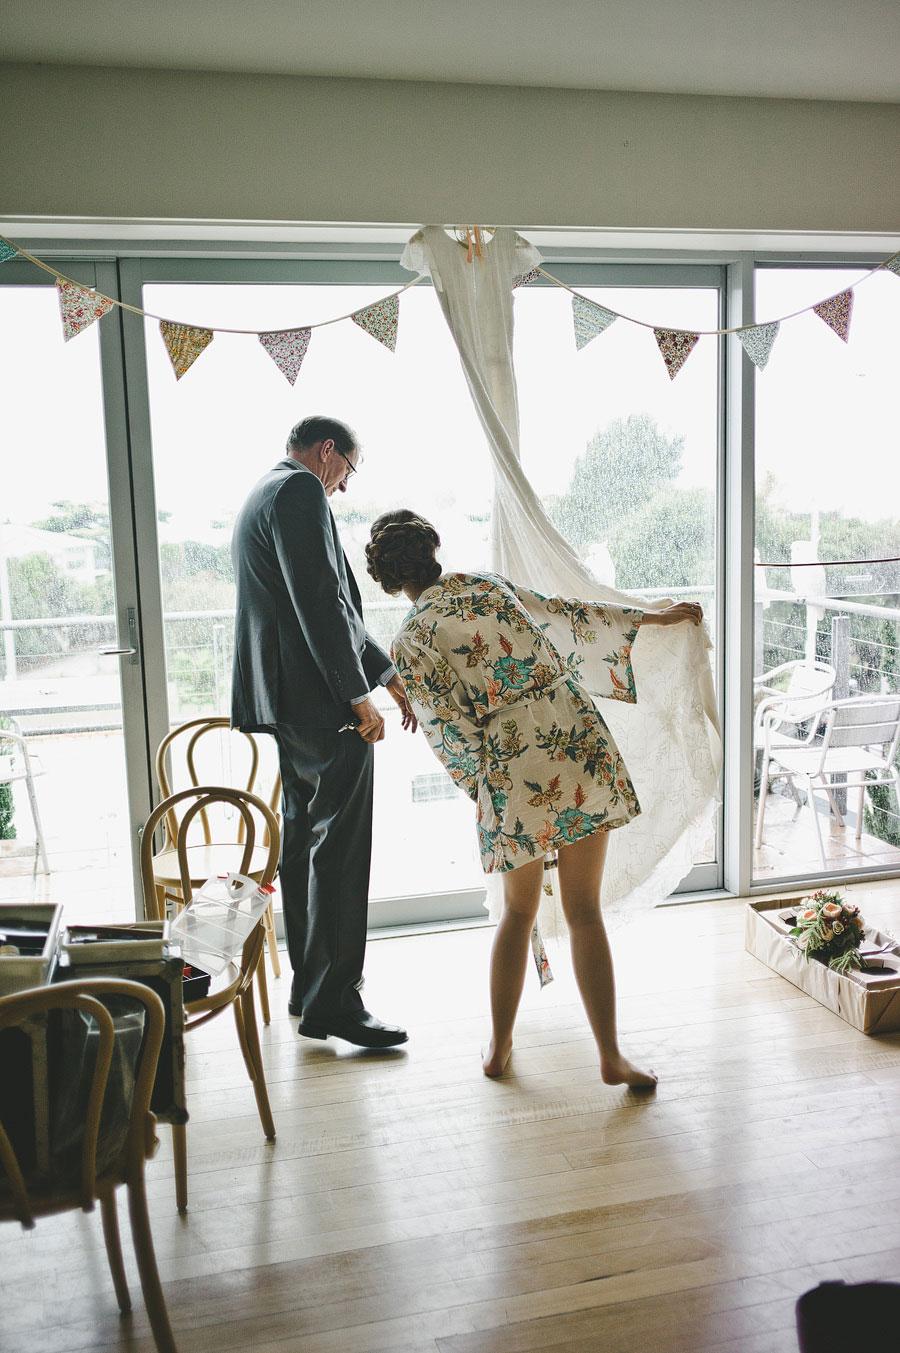 Pheonix apartments, Lorne - bride checking wedding dress